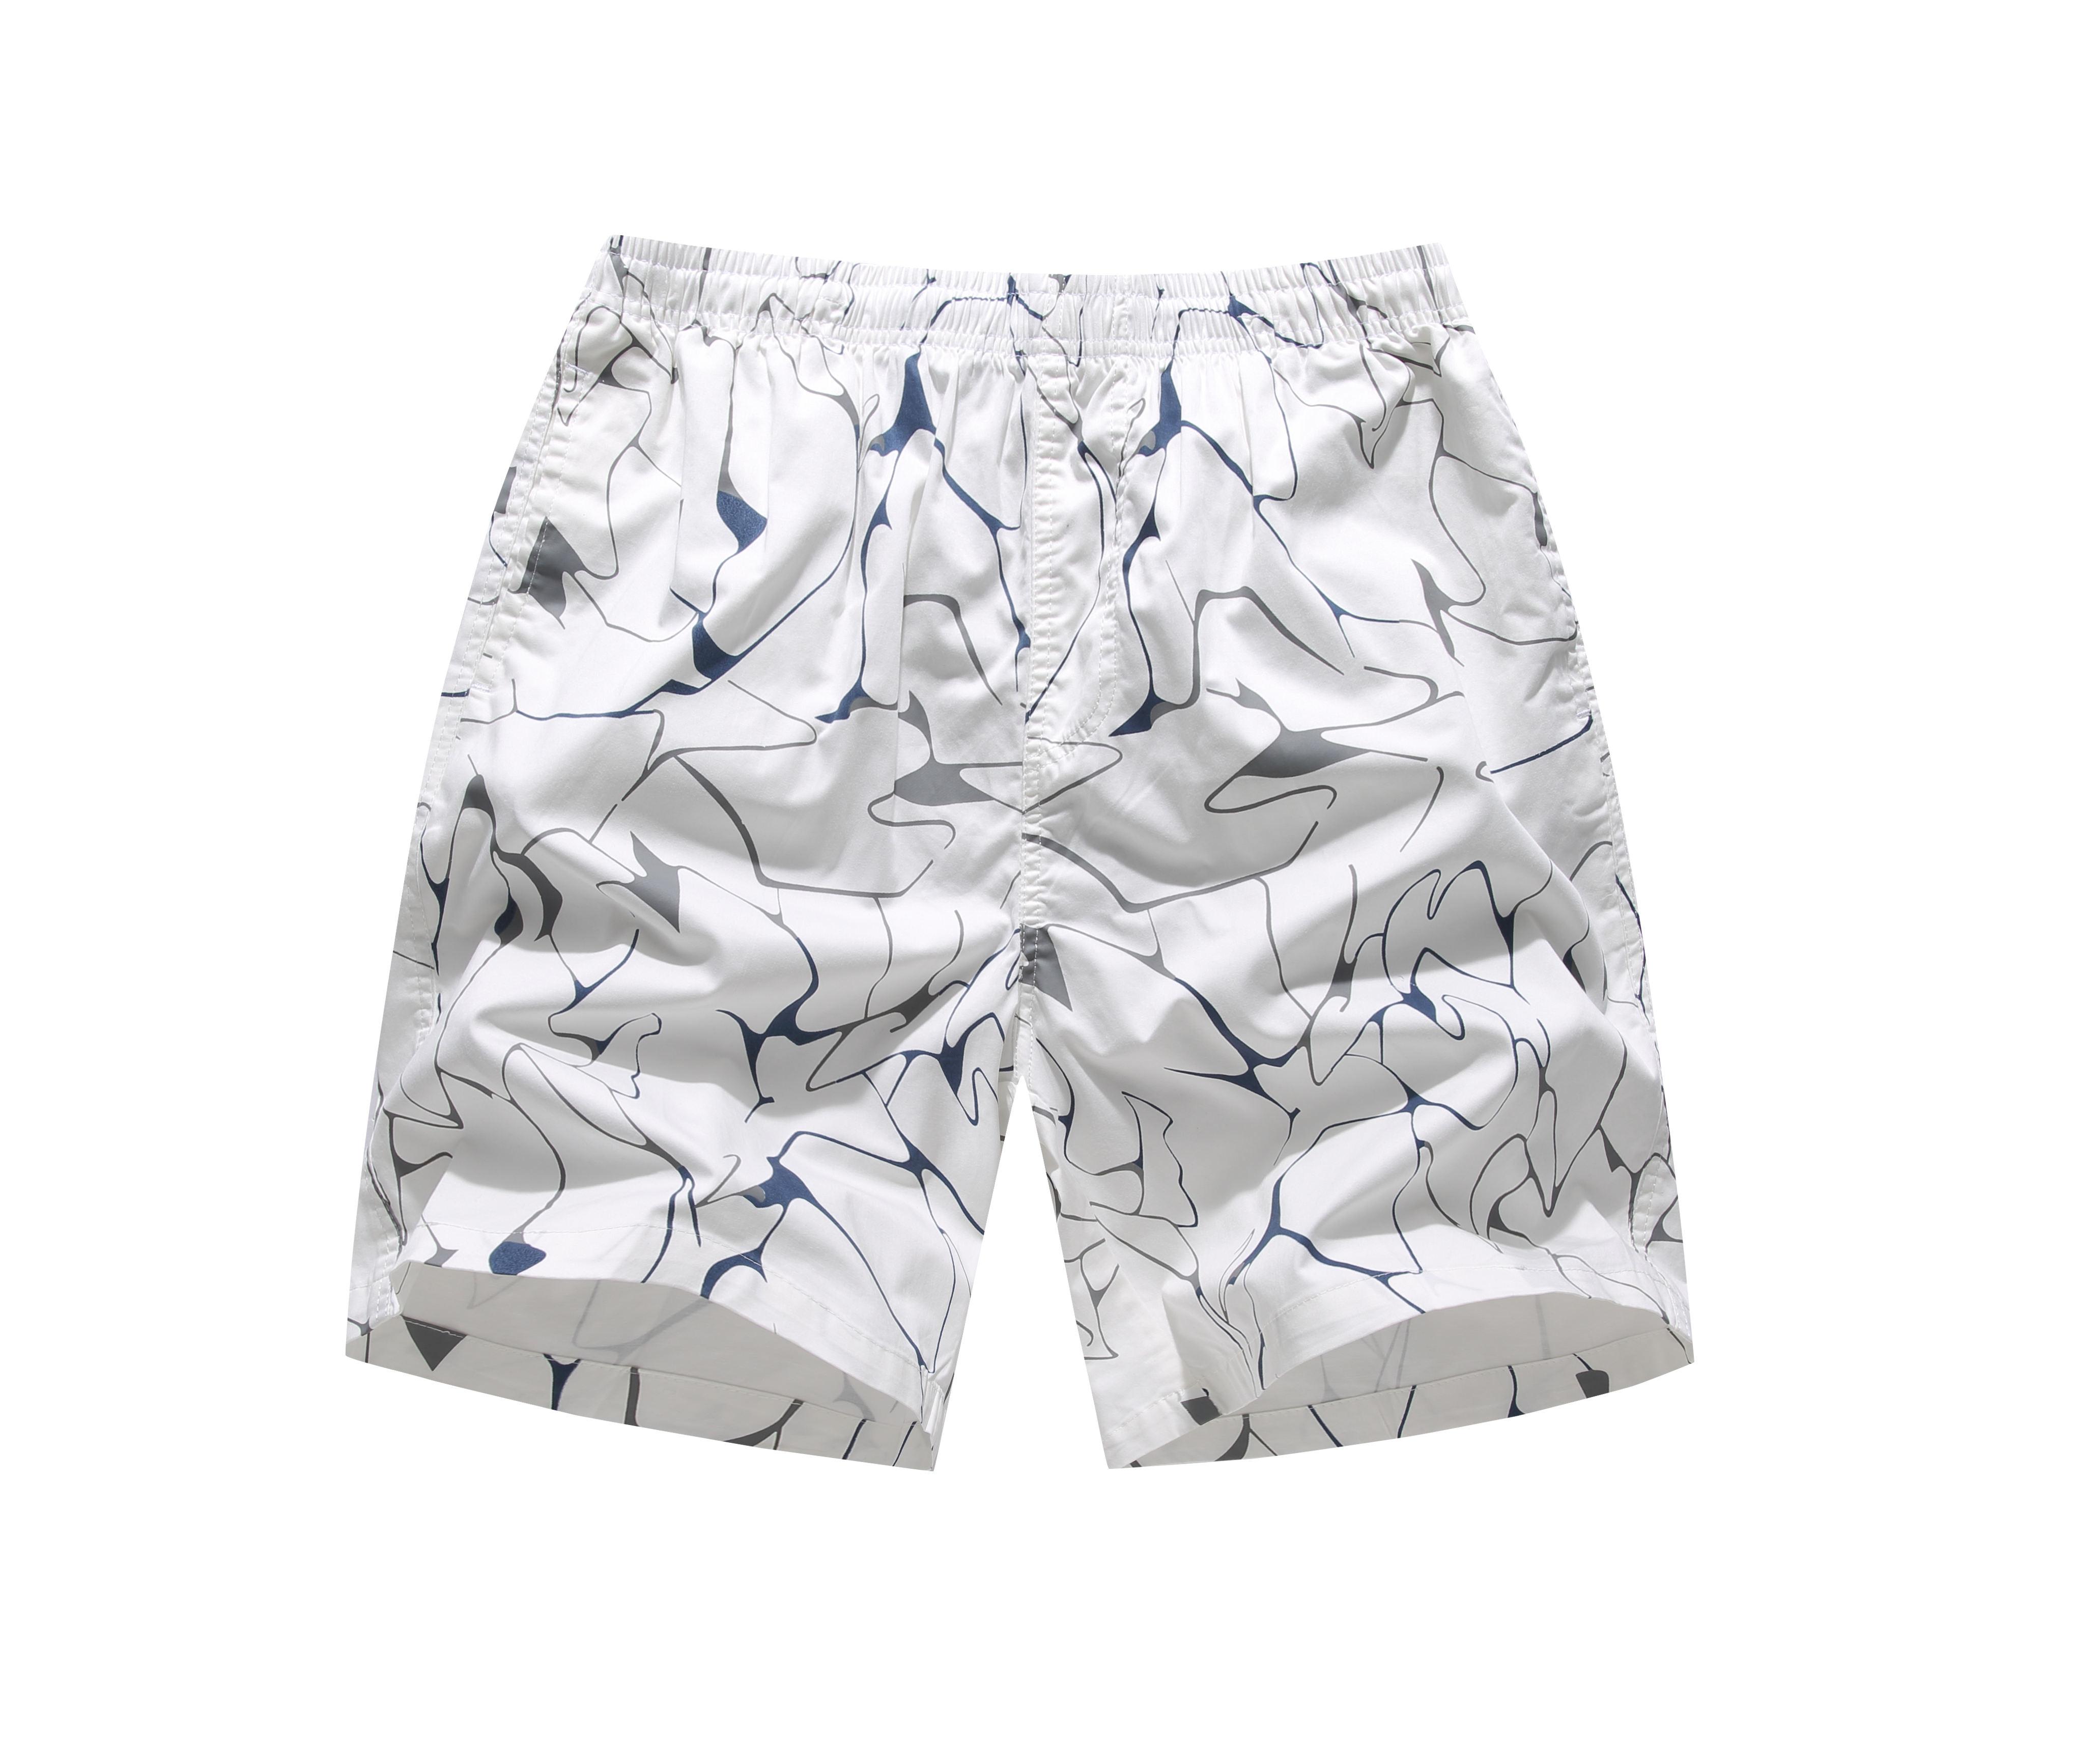 Boardshort Mermaid Blue Fish Scales Boys Teen Quick Dry Sports Trunks